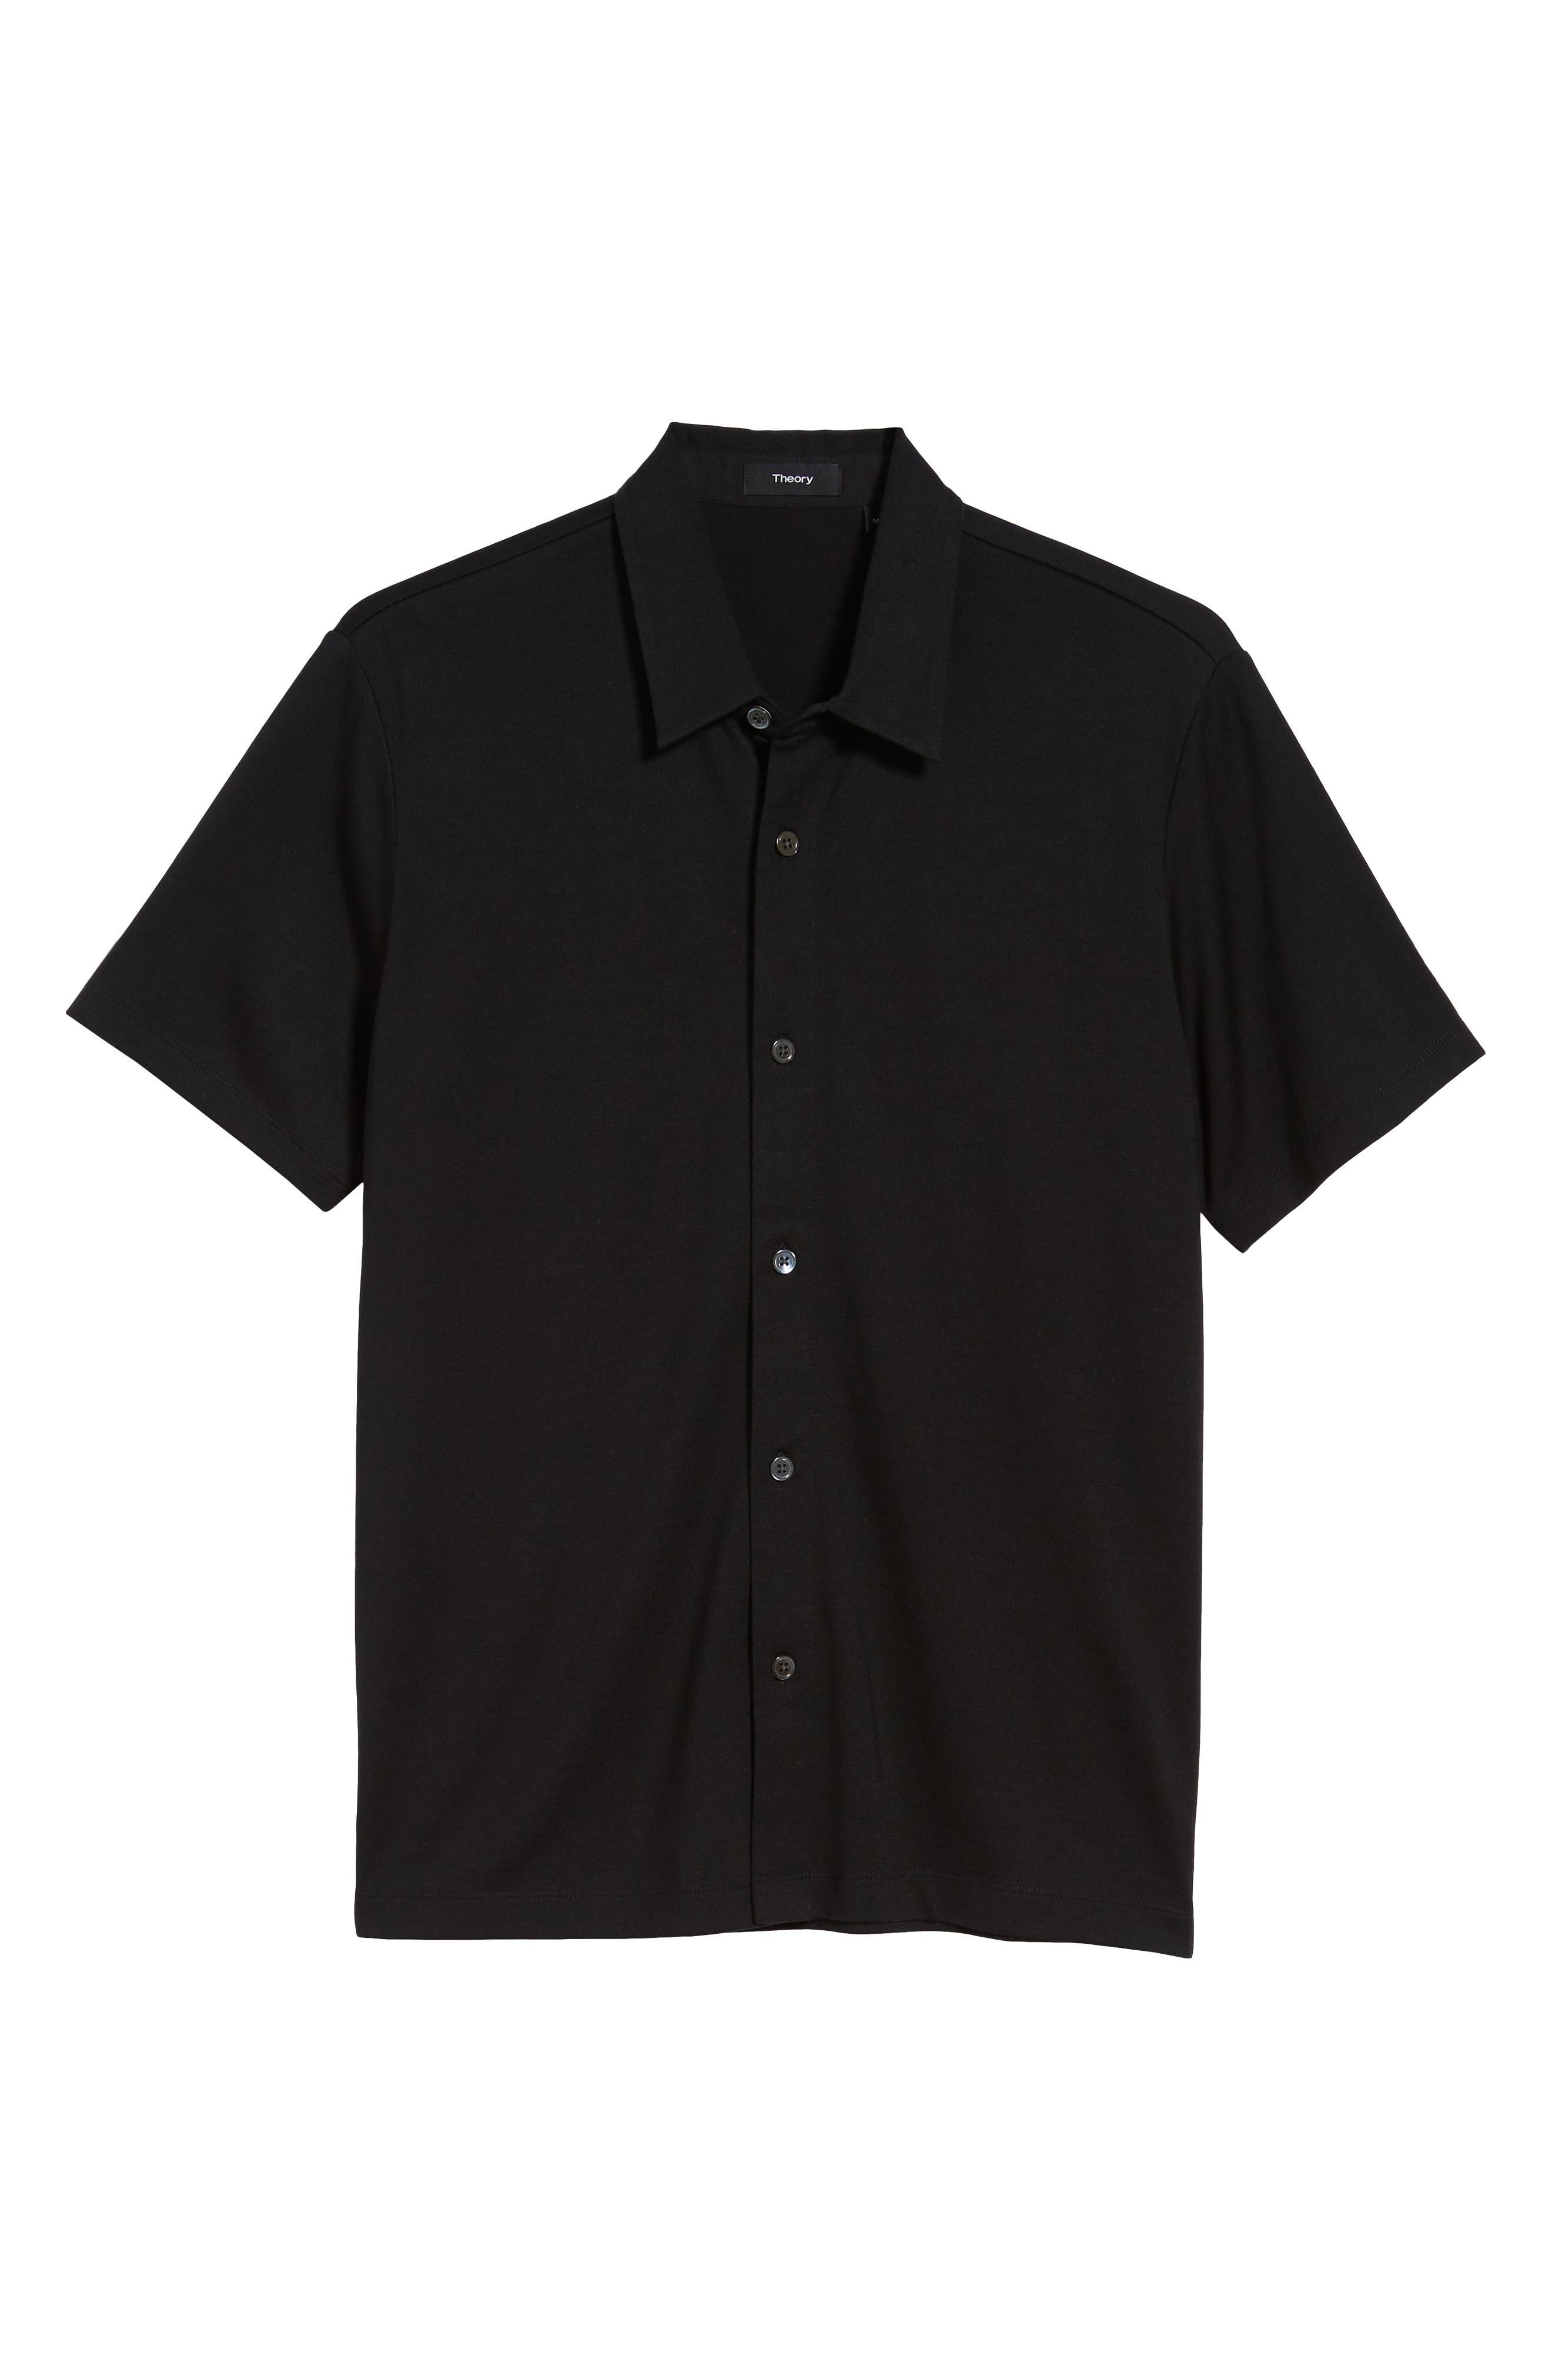 Incisi Slim Fit Knit Silk Blend Shirt,                             Alternate thumbnail 6, color,                             BLACK